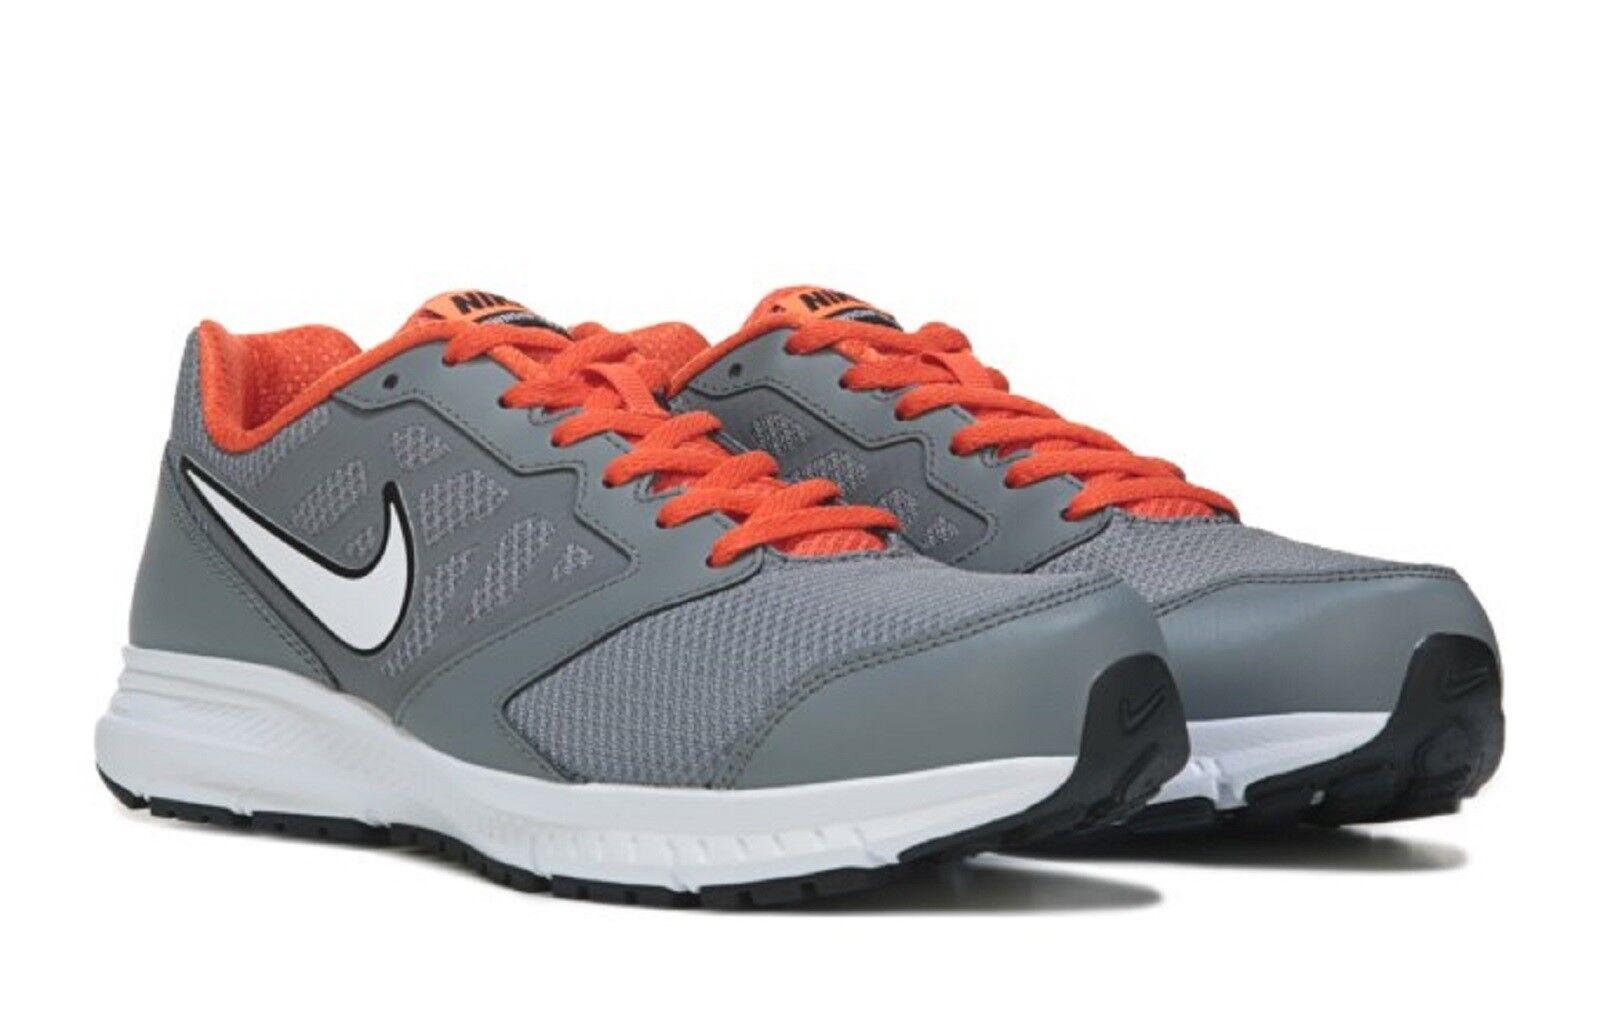 lower price with 736b4 ab8dc NIKE Men s  DOWNSHIFTER 6  Running shoes Grey orange Wht Blk Sz. 9M NIB